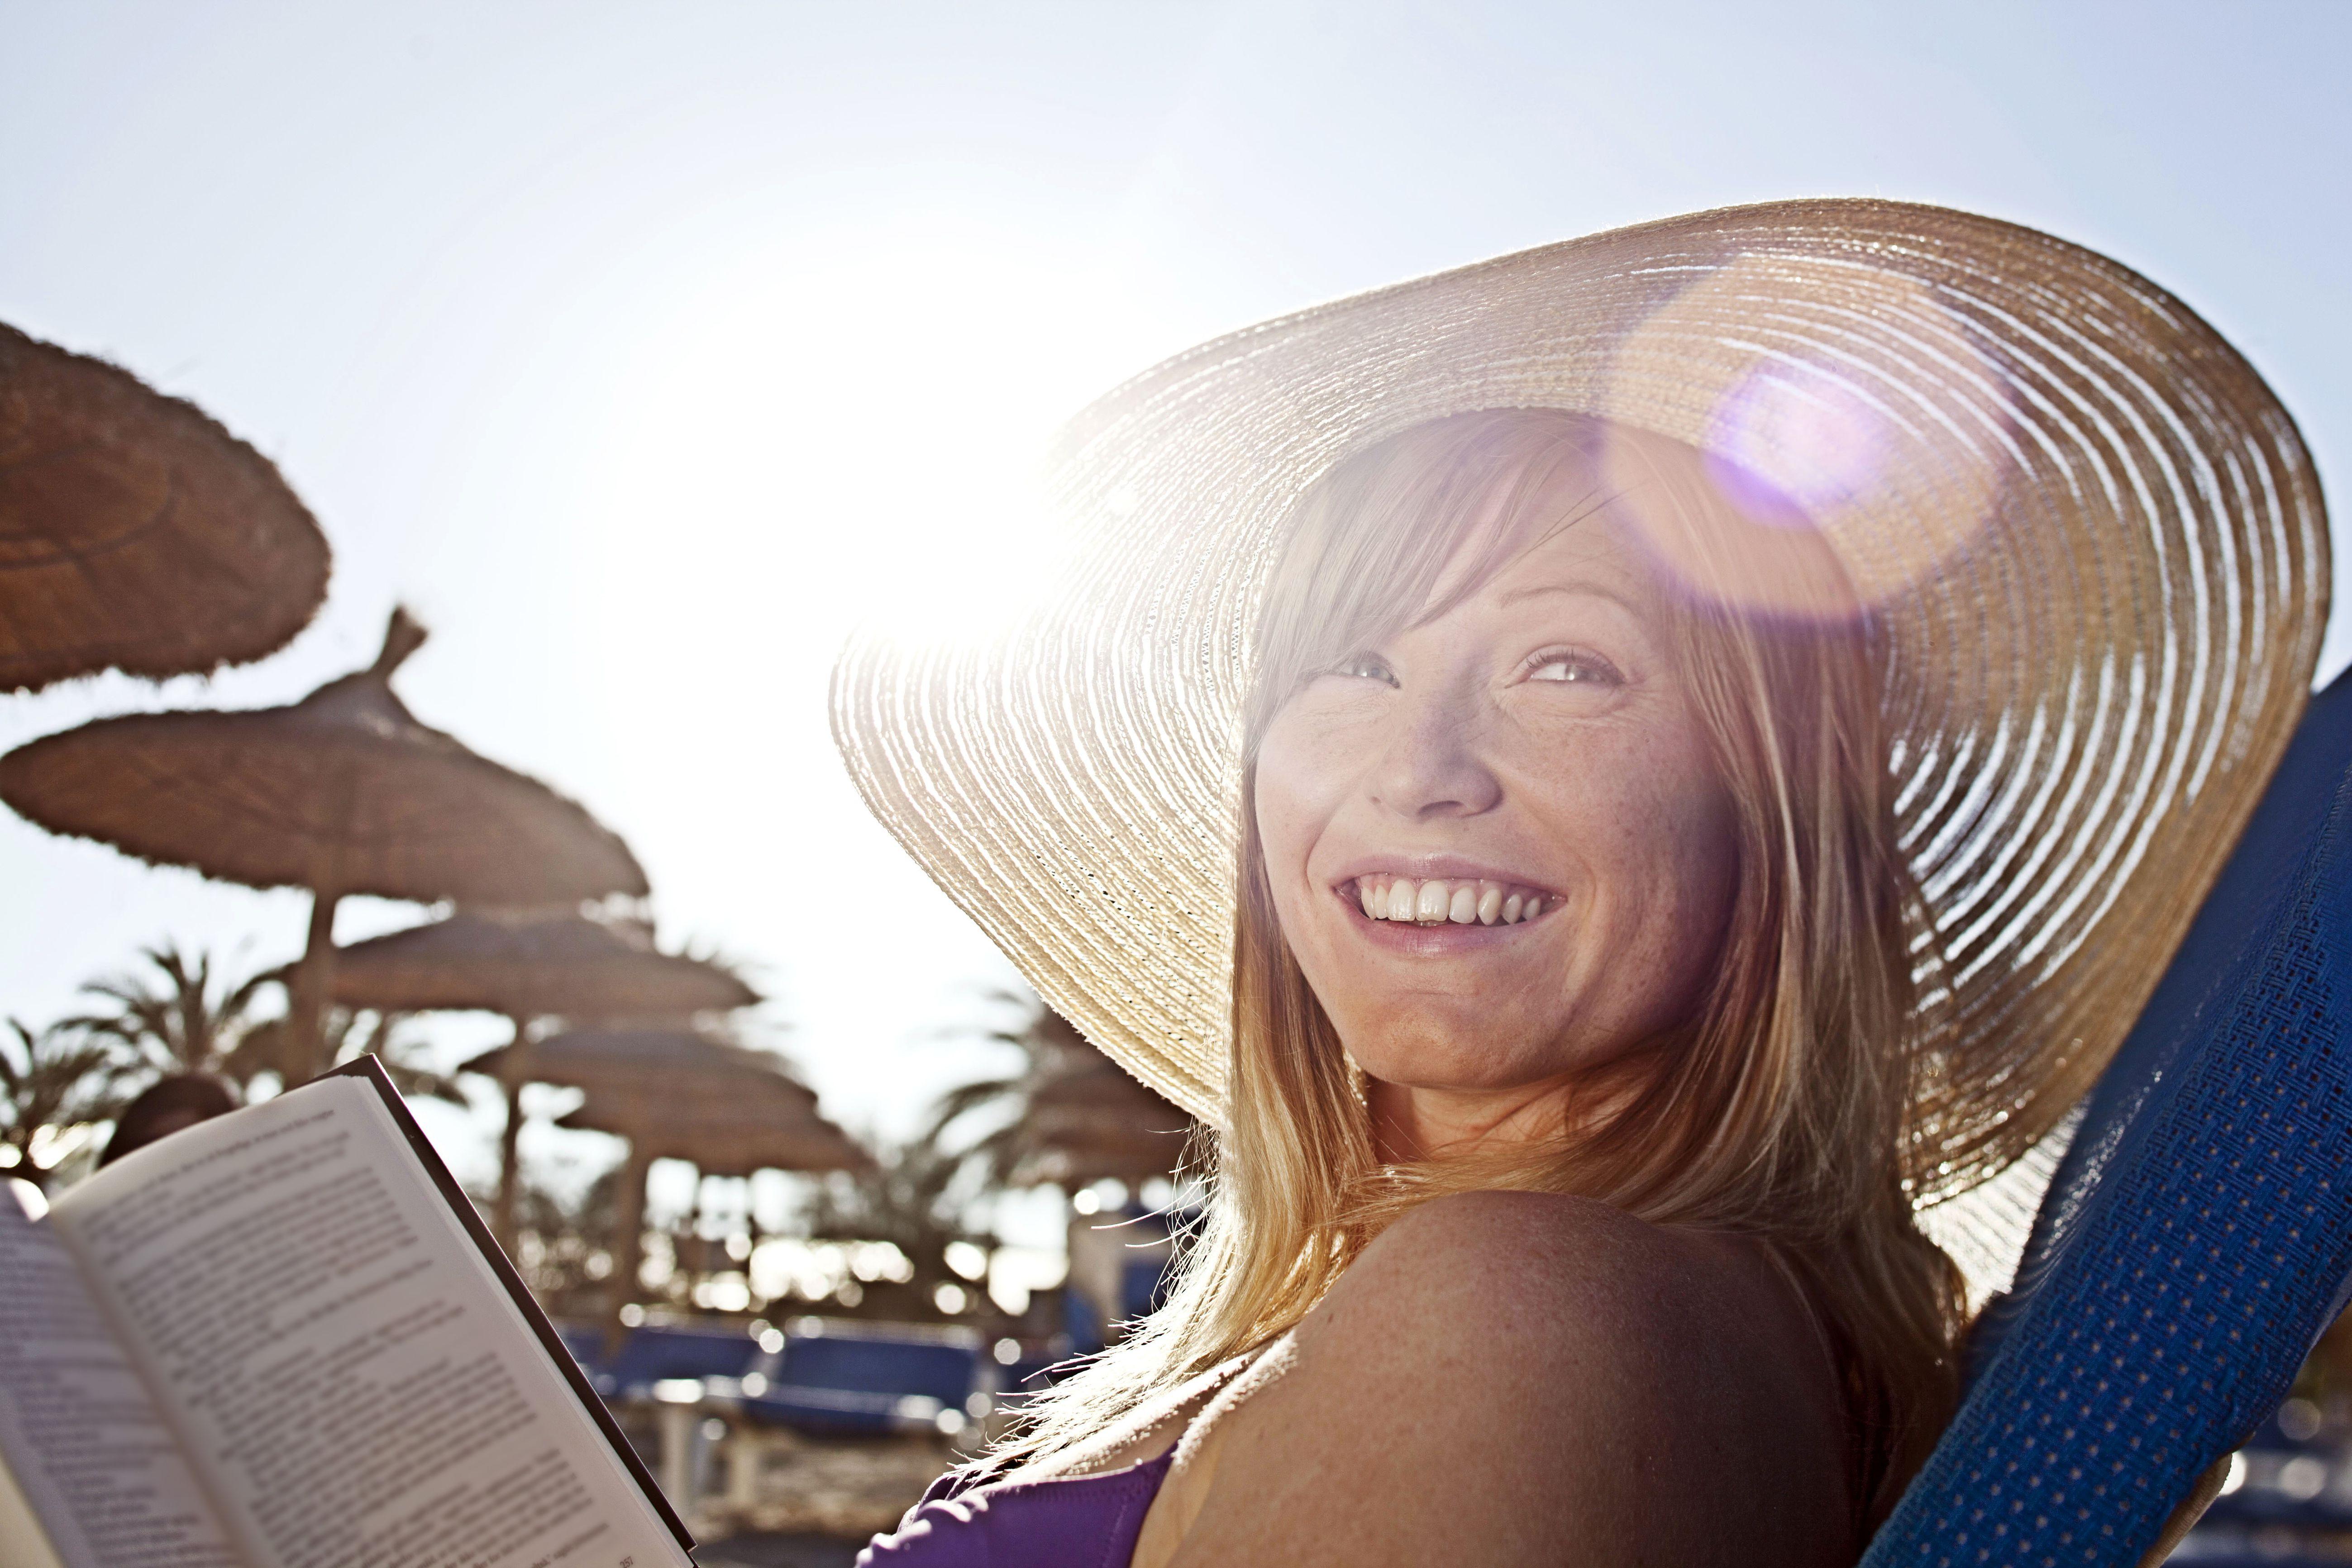 Woman sunning herself